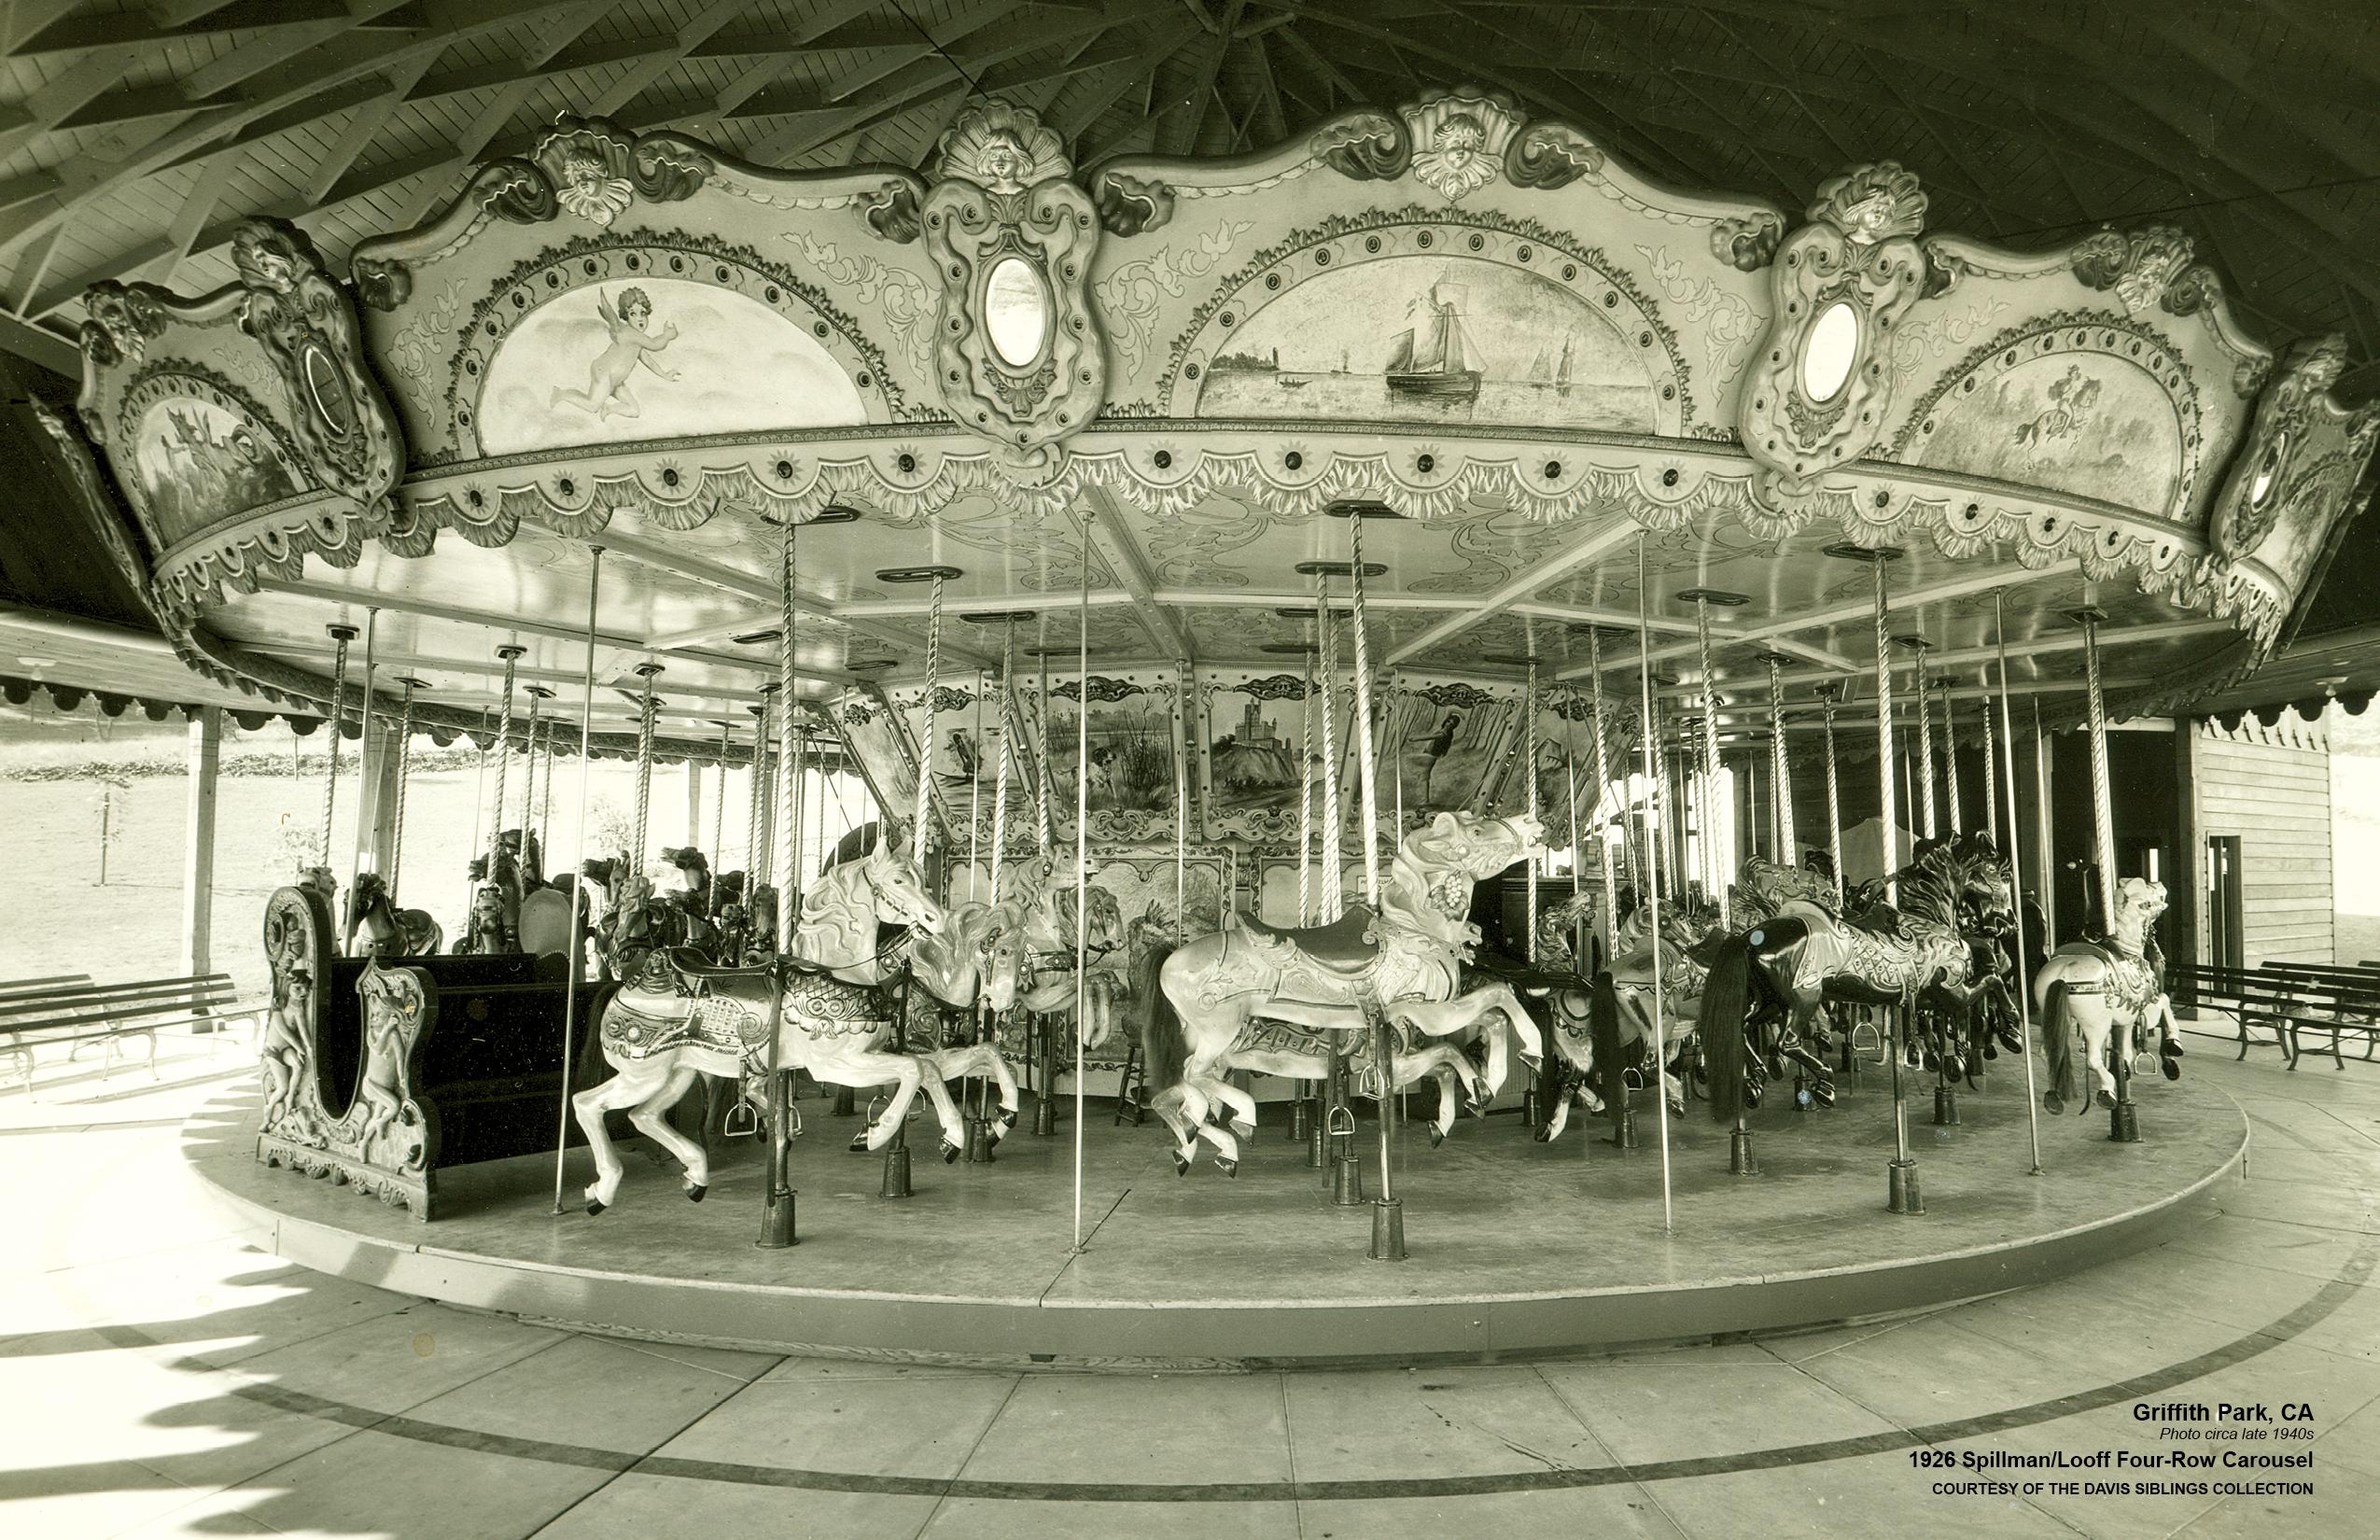 Griffith Park Merry-Go-Round -CarouselHistory.com